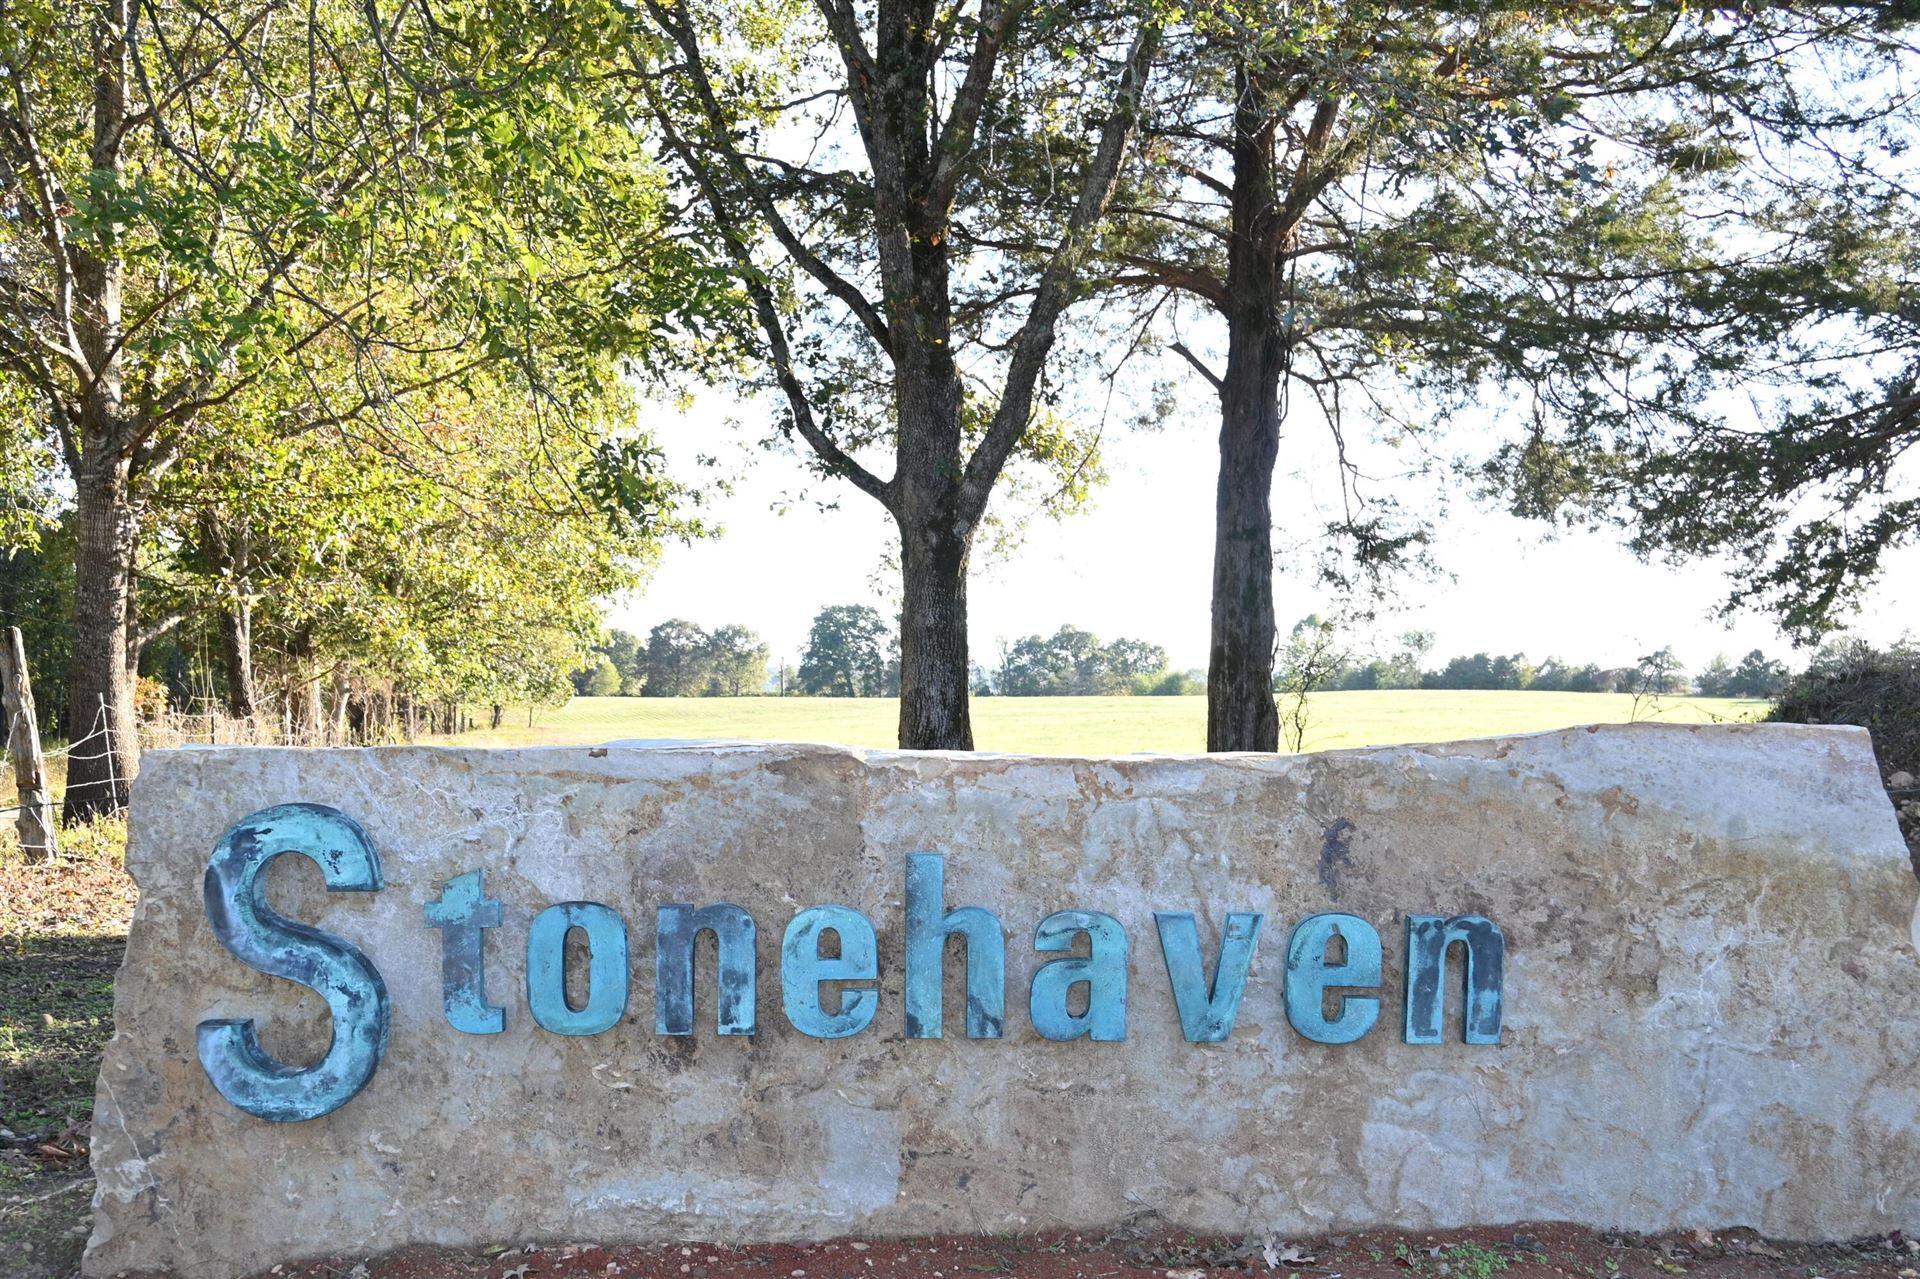 Photo of Lot 16 Stonehaven Way, Shell Knob, MO 65747 (MLS # 60203689)